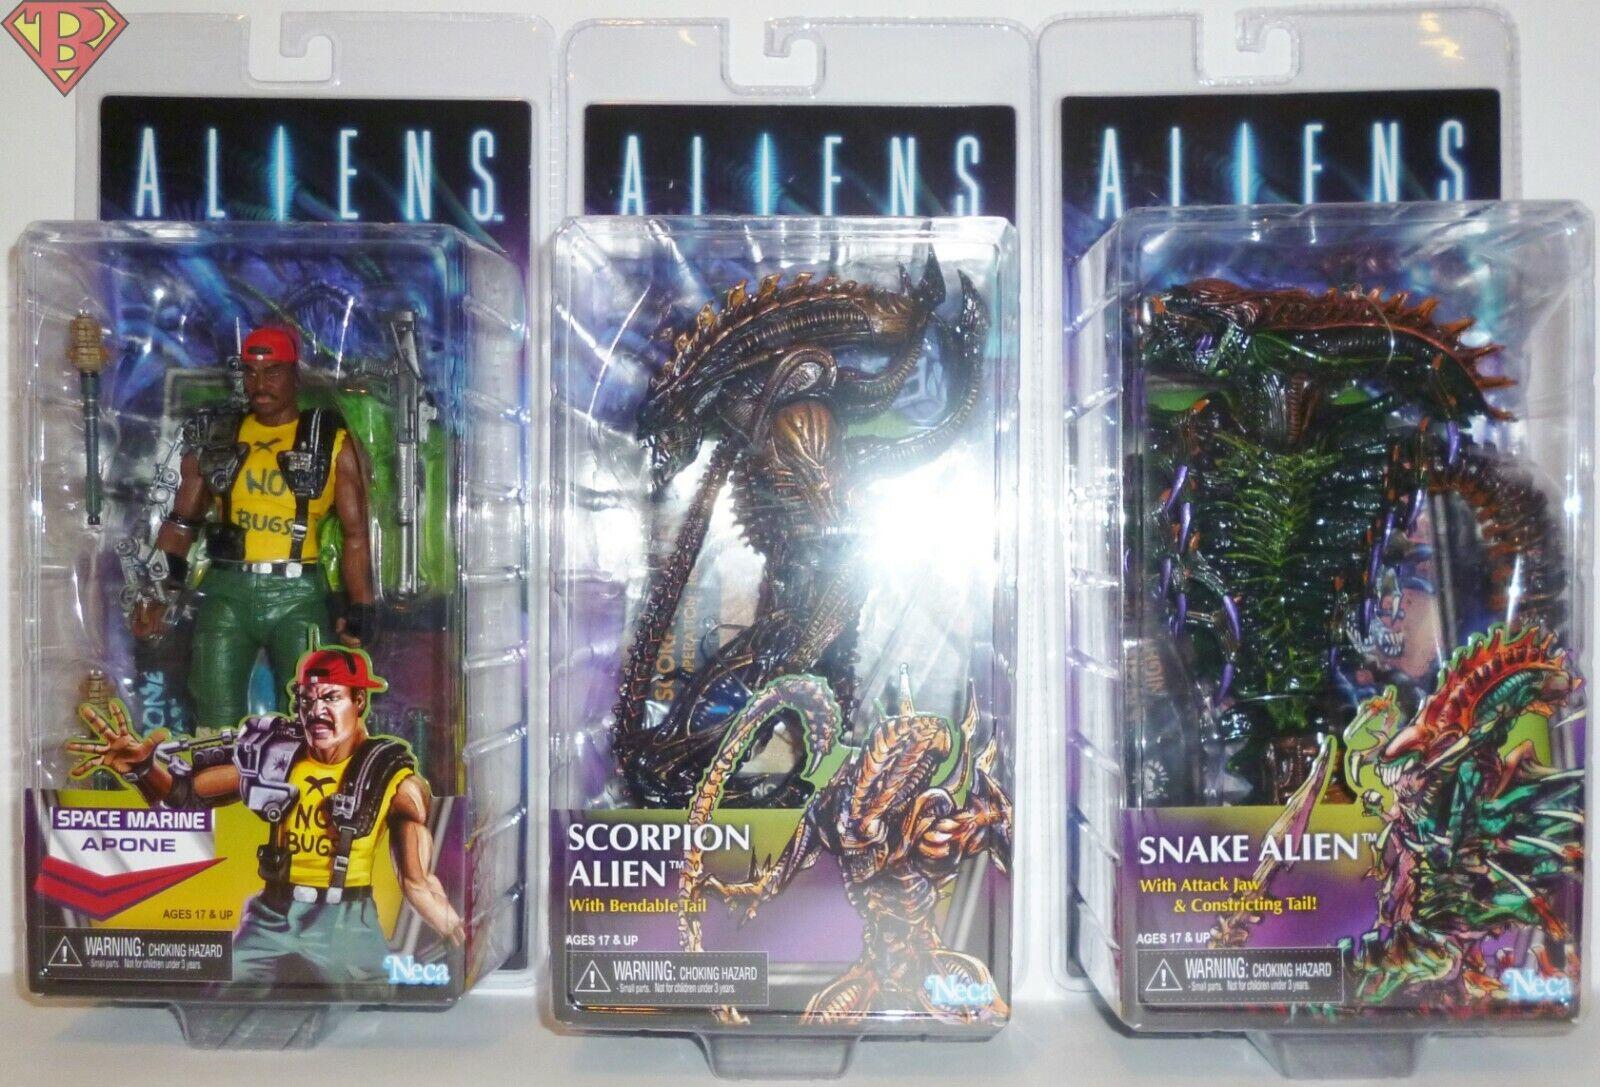 SGT. APONE SCORPION & SNAKE ALIEN Aliens 7 cifra Set of 3 Series 13 Neca 2019